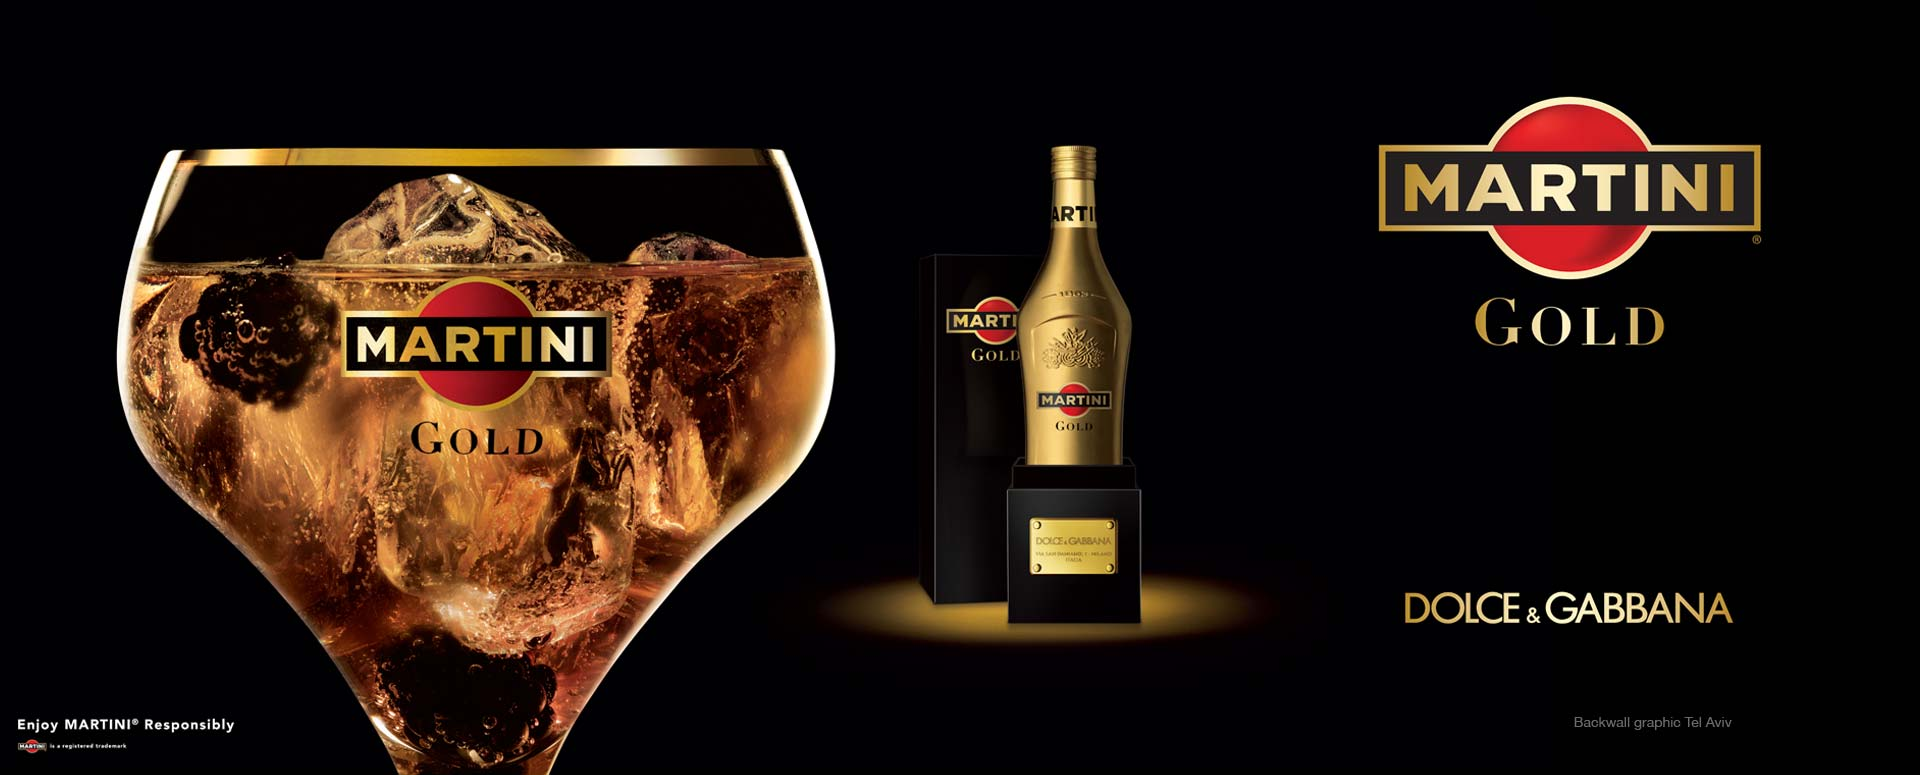 Martini Gold HD wallpapers, Desktop wallpaper - most viewed